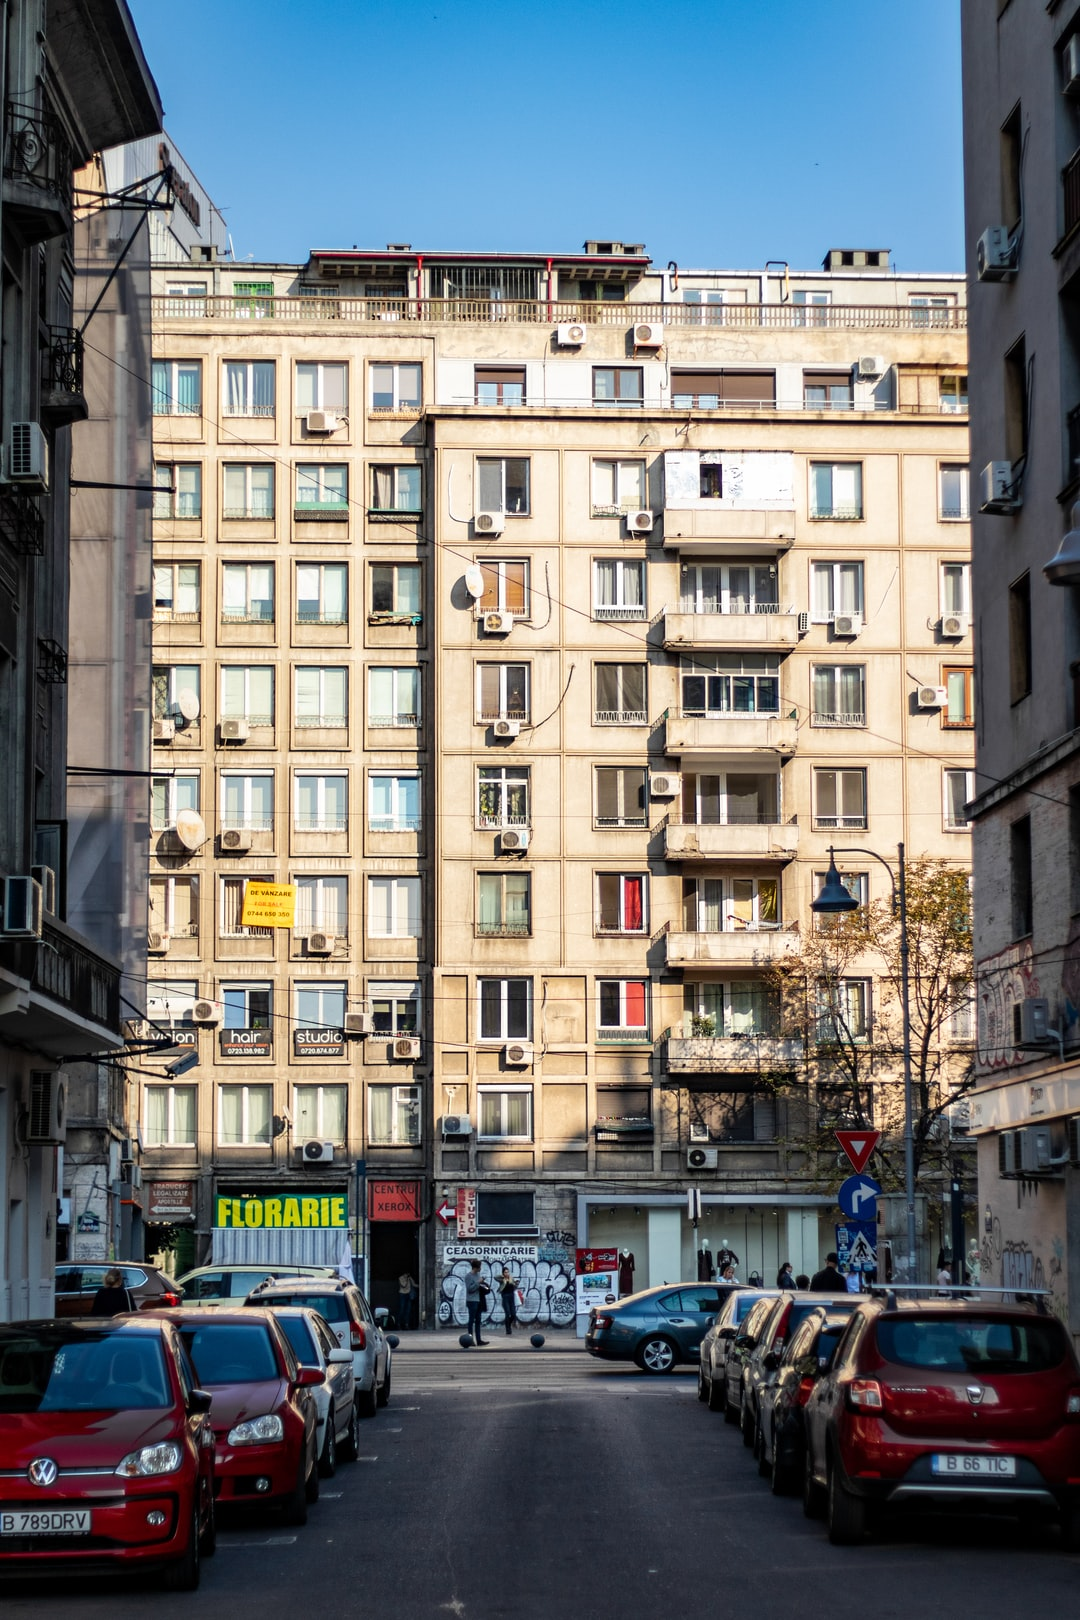 Streets of Bucharest, near Romana Square